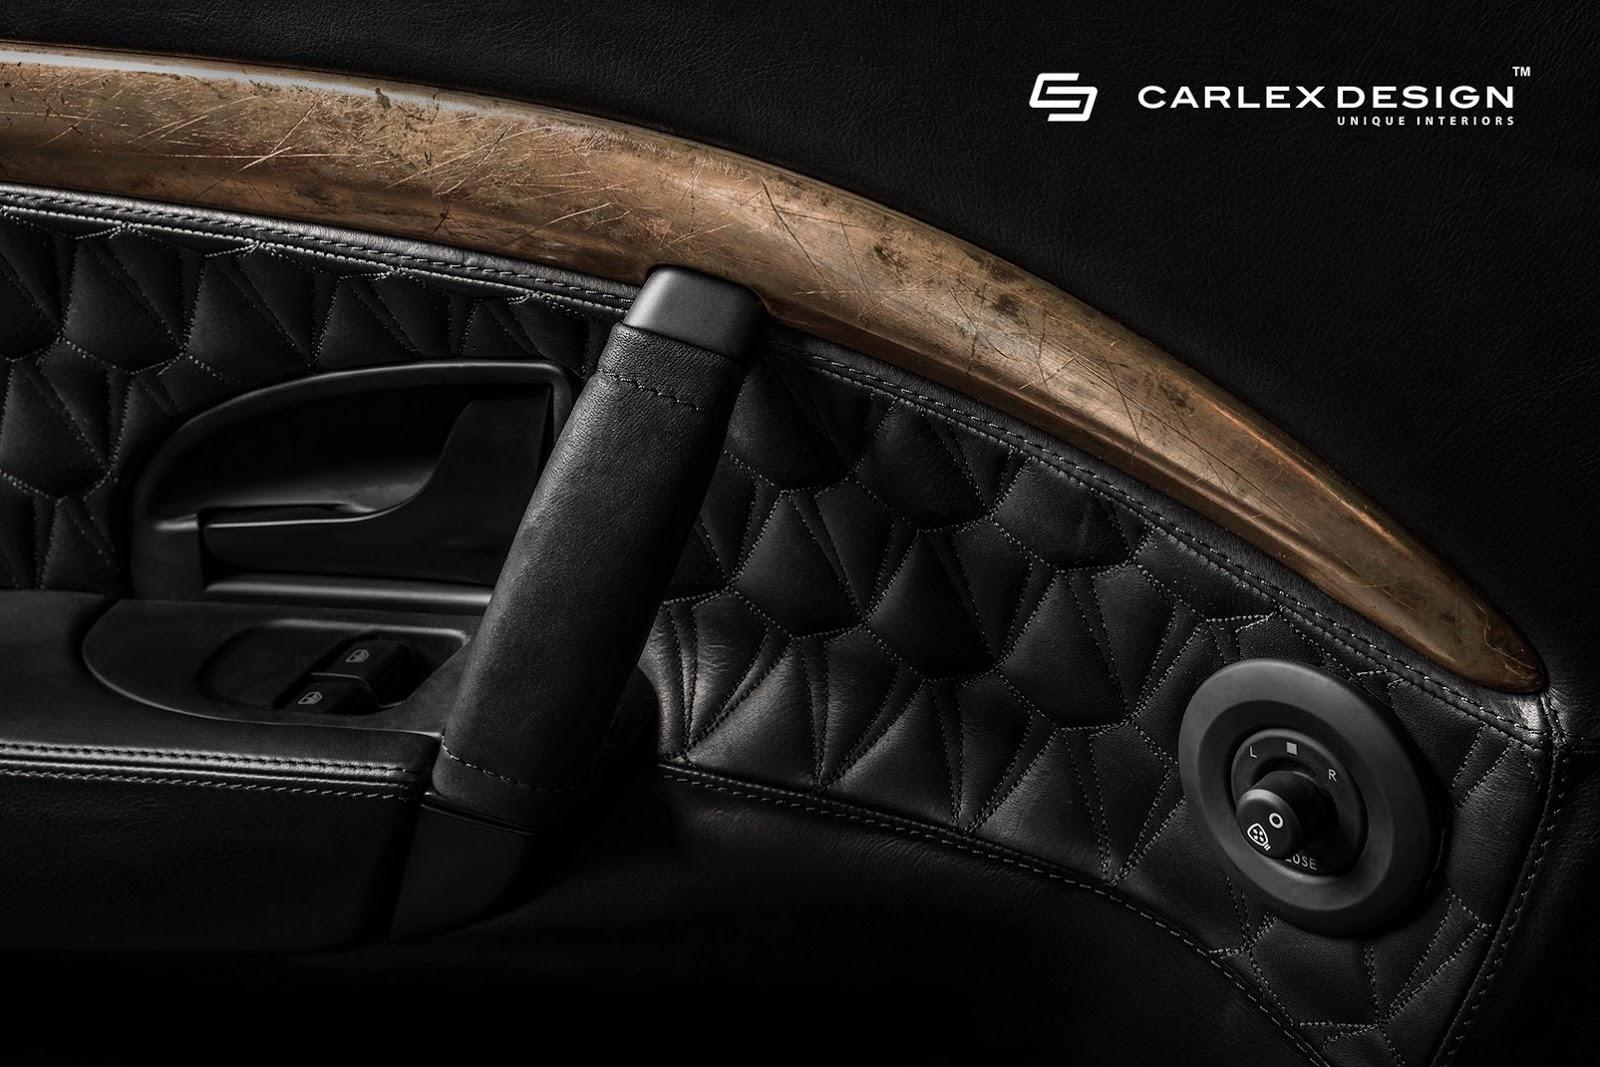 Carlex-Maserati-Granturismo-11